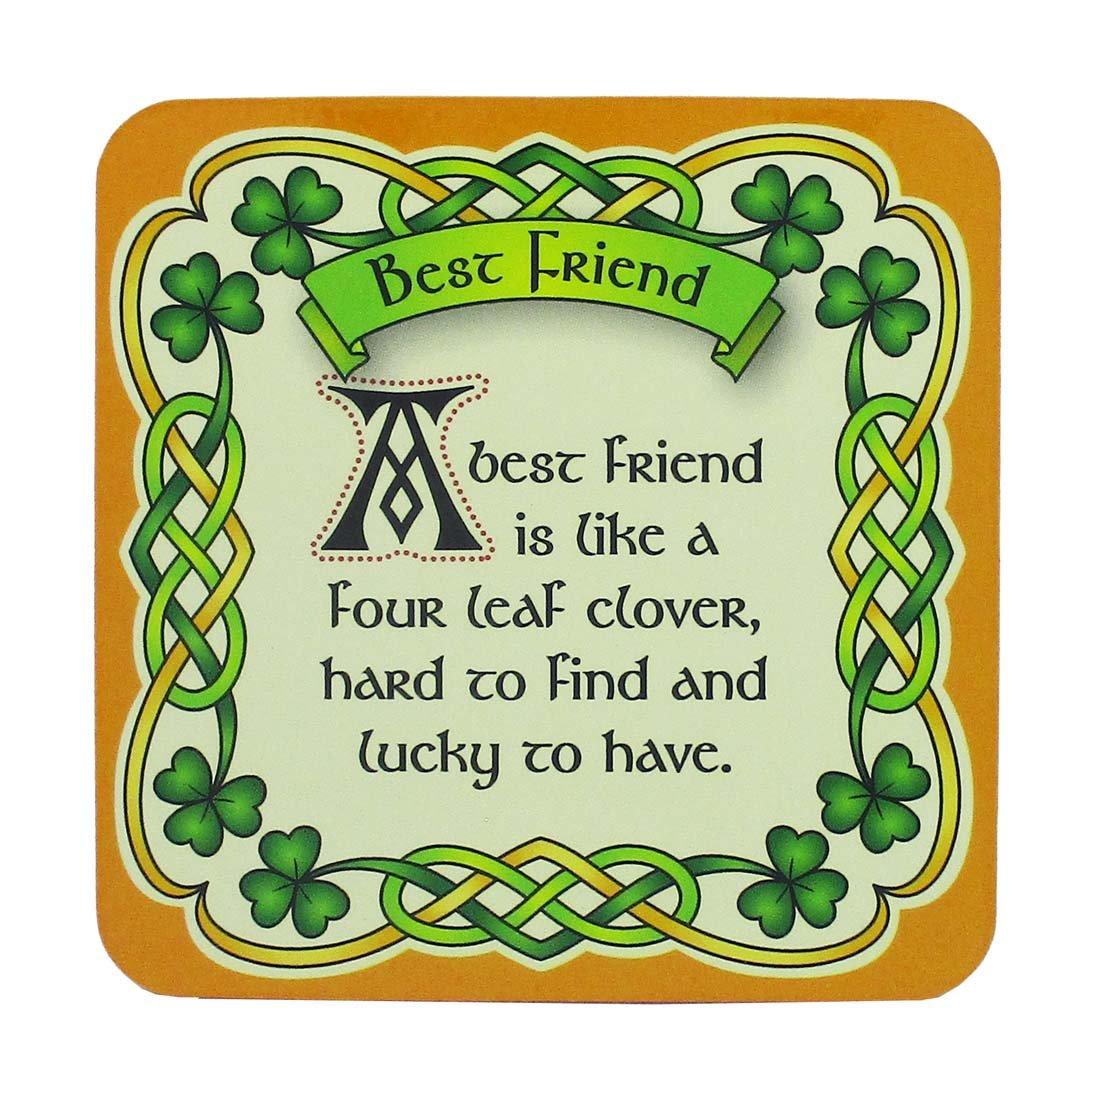 Royal Tara Irish Celtic Coaster with Best Friend Design and Shamrock Design